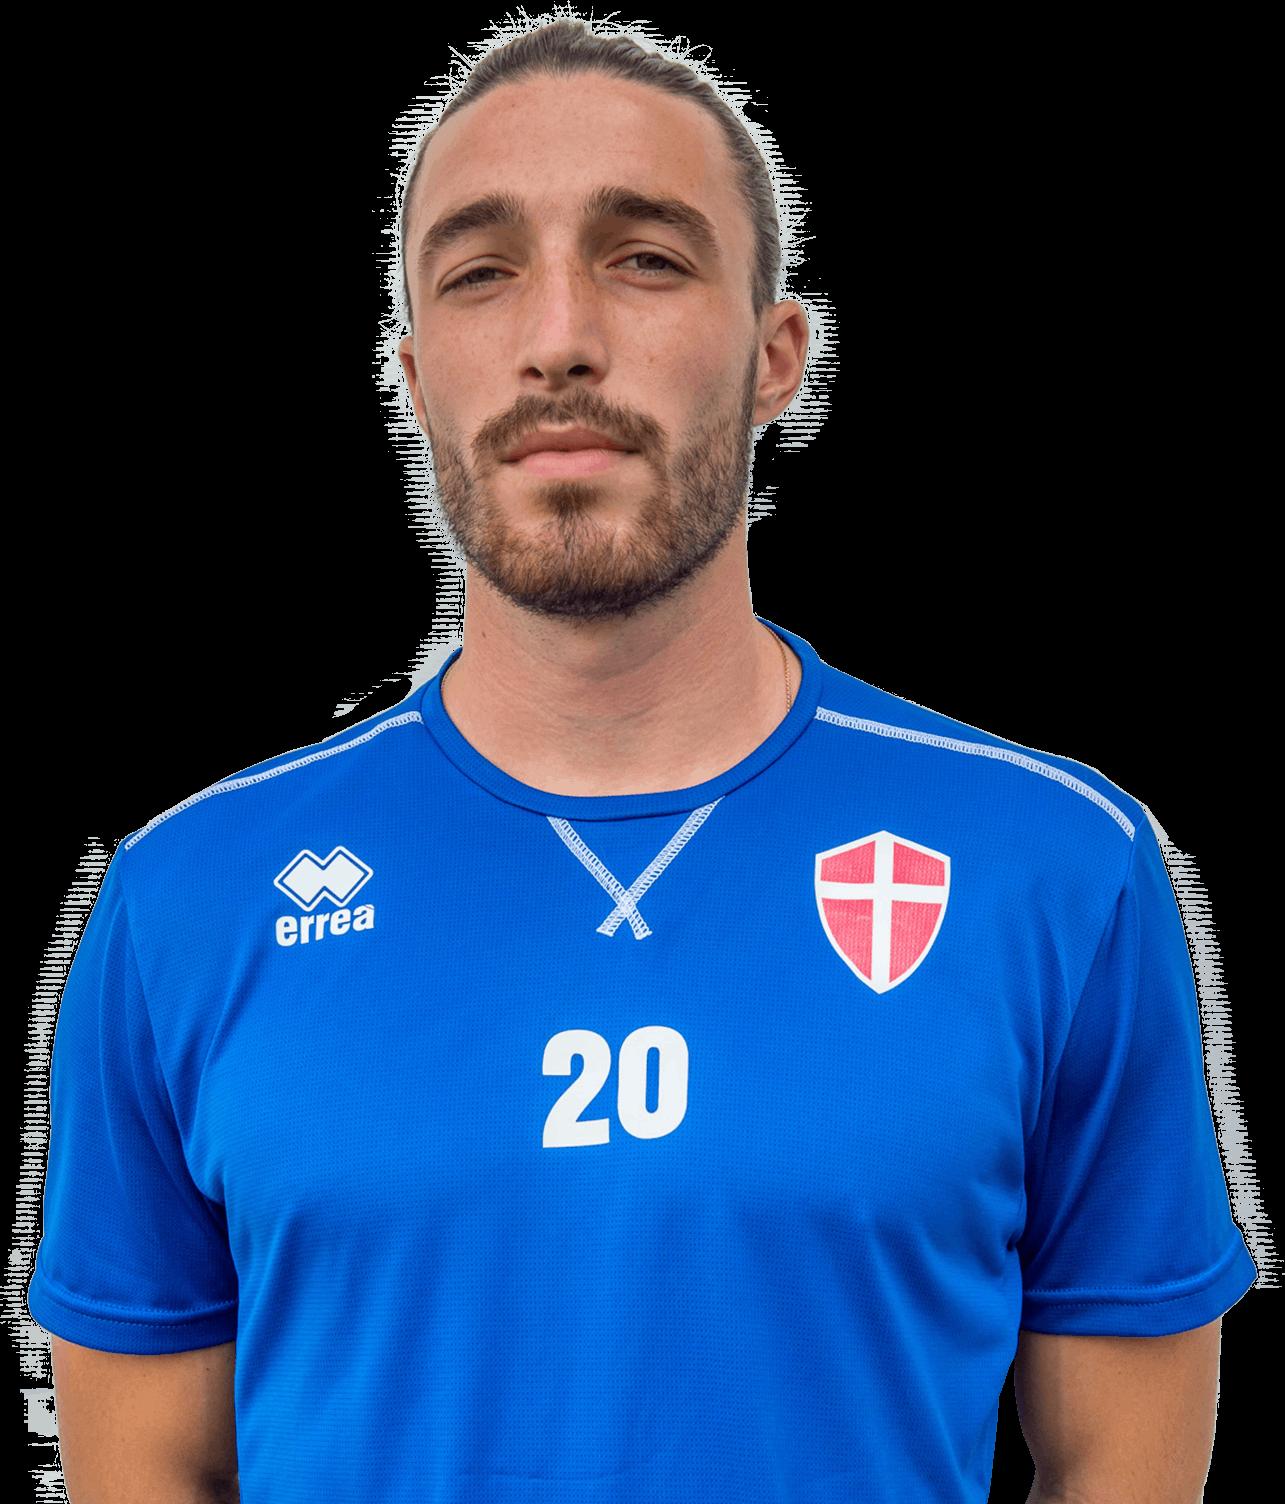 You are currently viewing Mirko Bortoletti